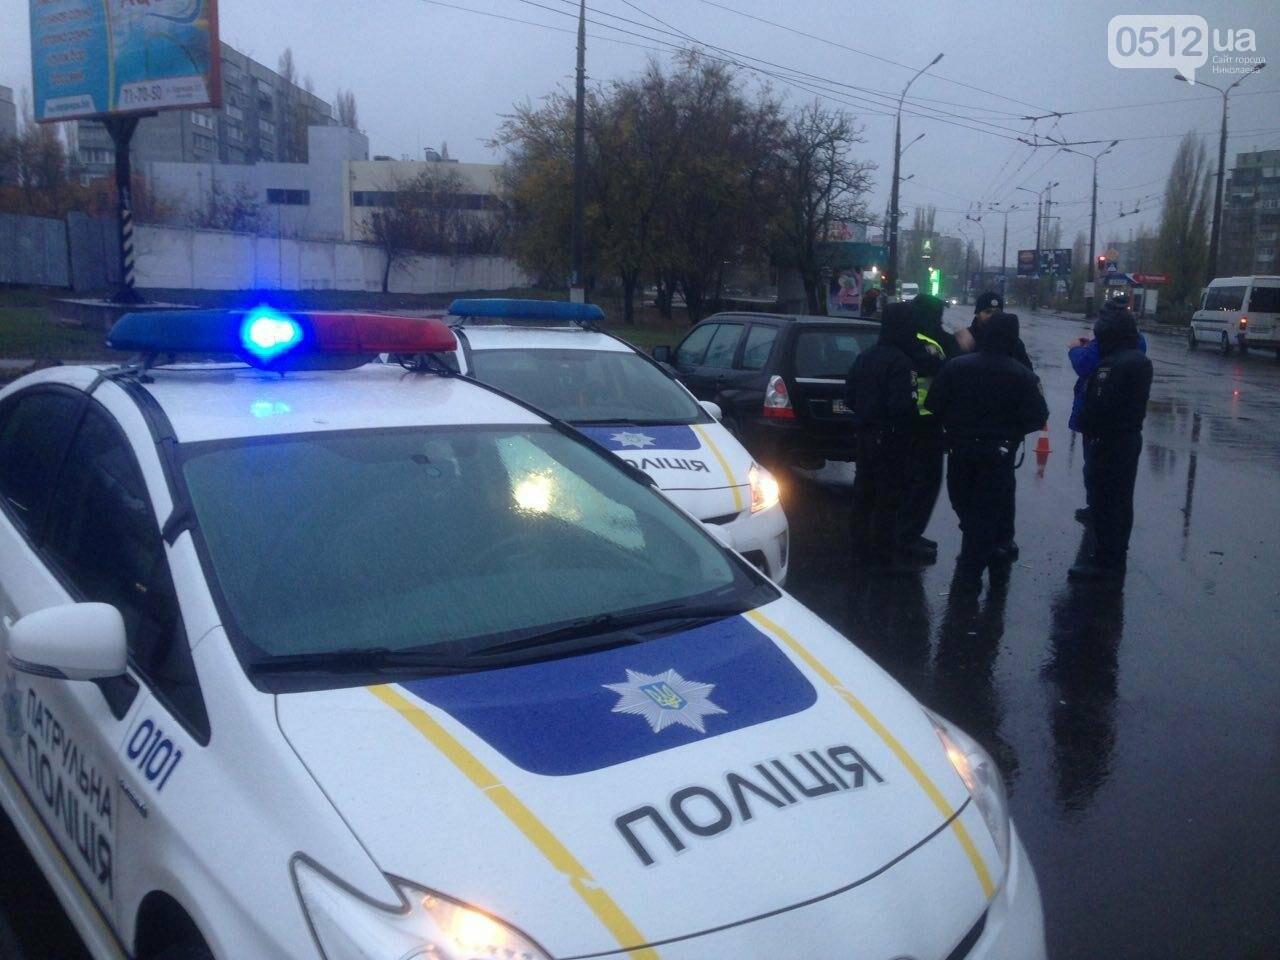 Возле спортшколы Надежда в Николаеве столкнулись Toyota и Subaru, - ФОТО , фото-3